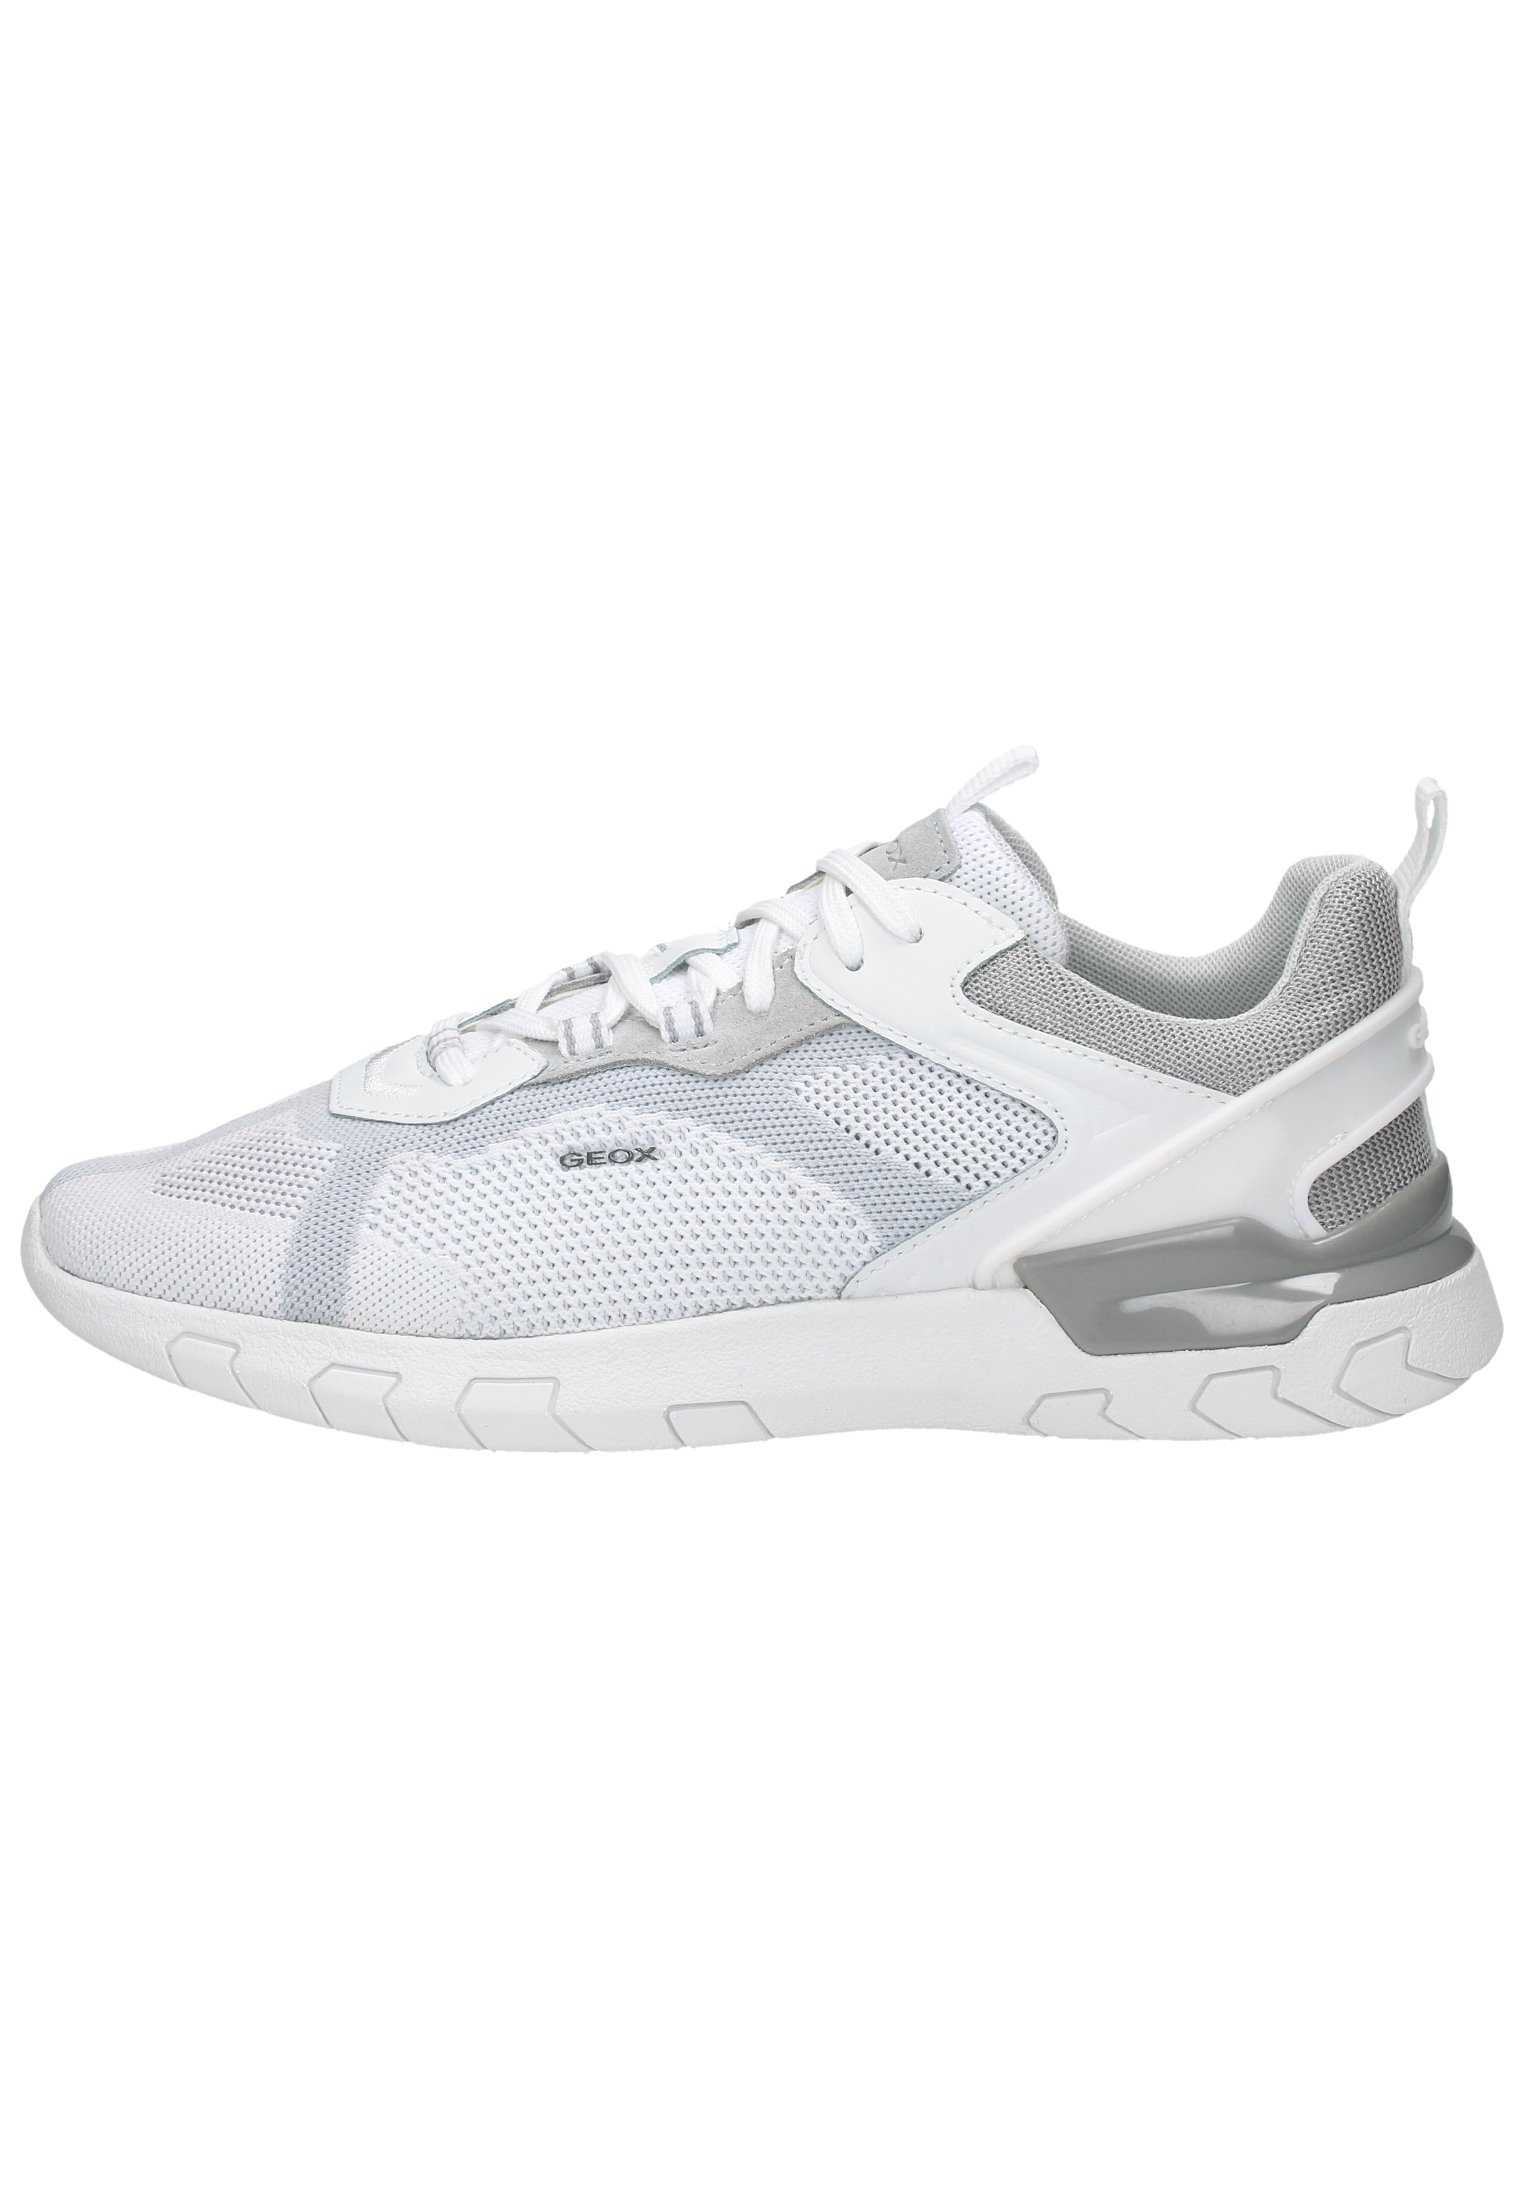 Uomo Sneakers basse - white/lt grey